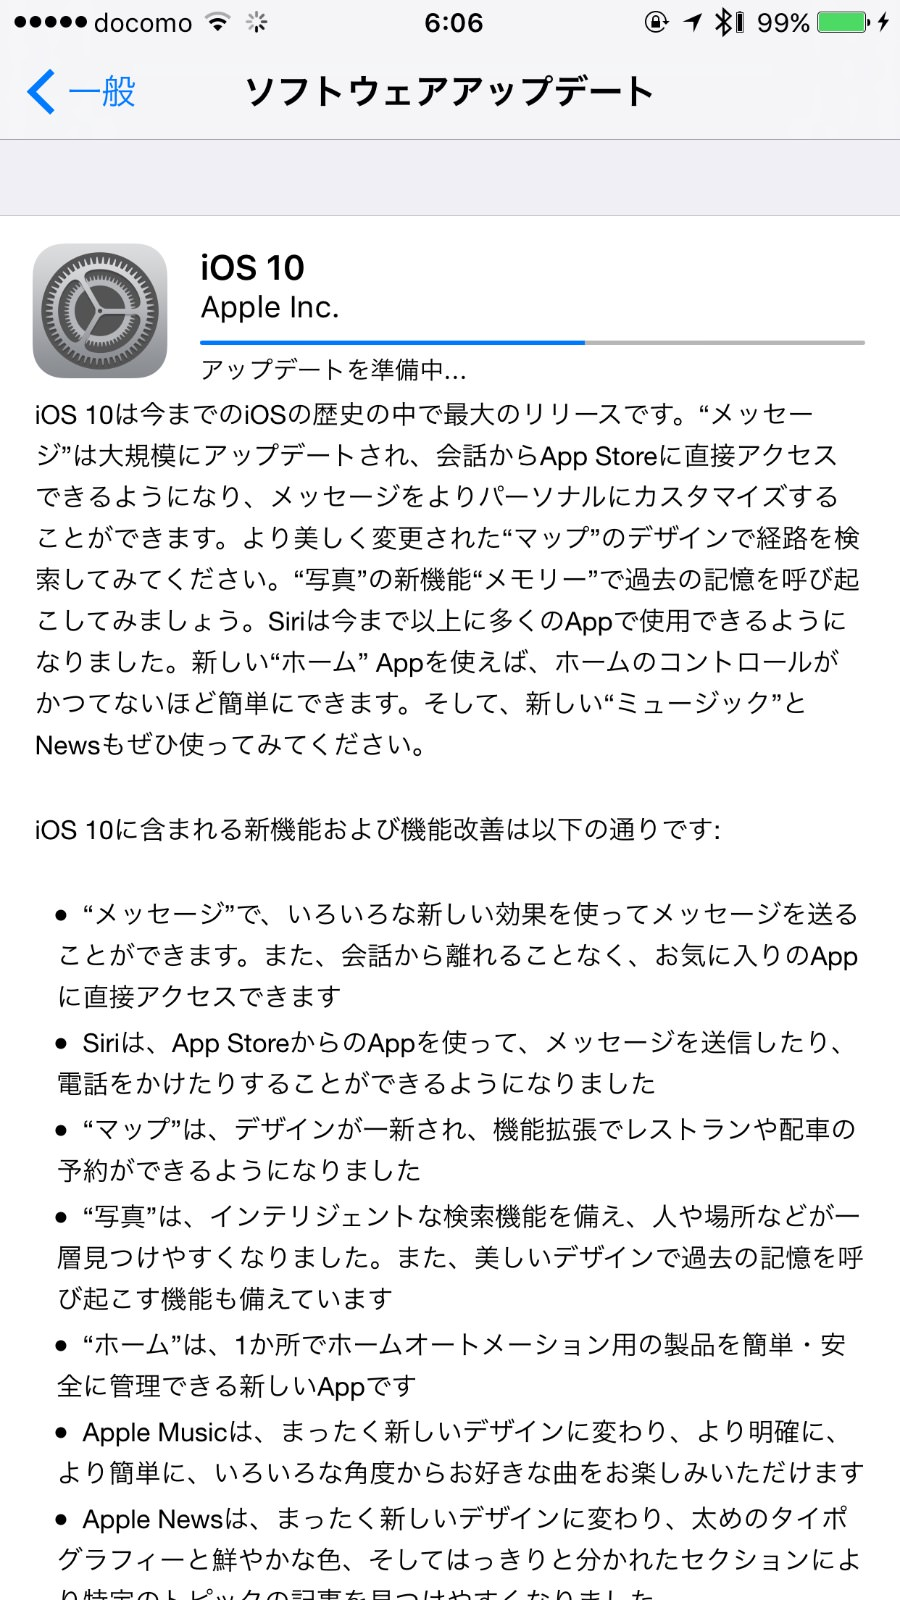 Ios 10 release 8440